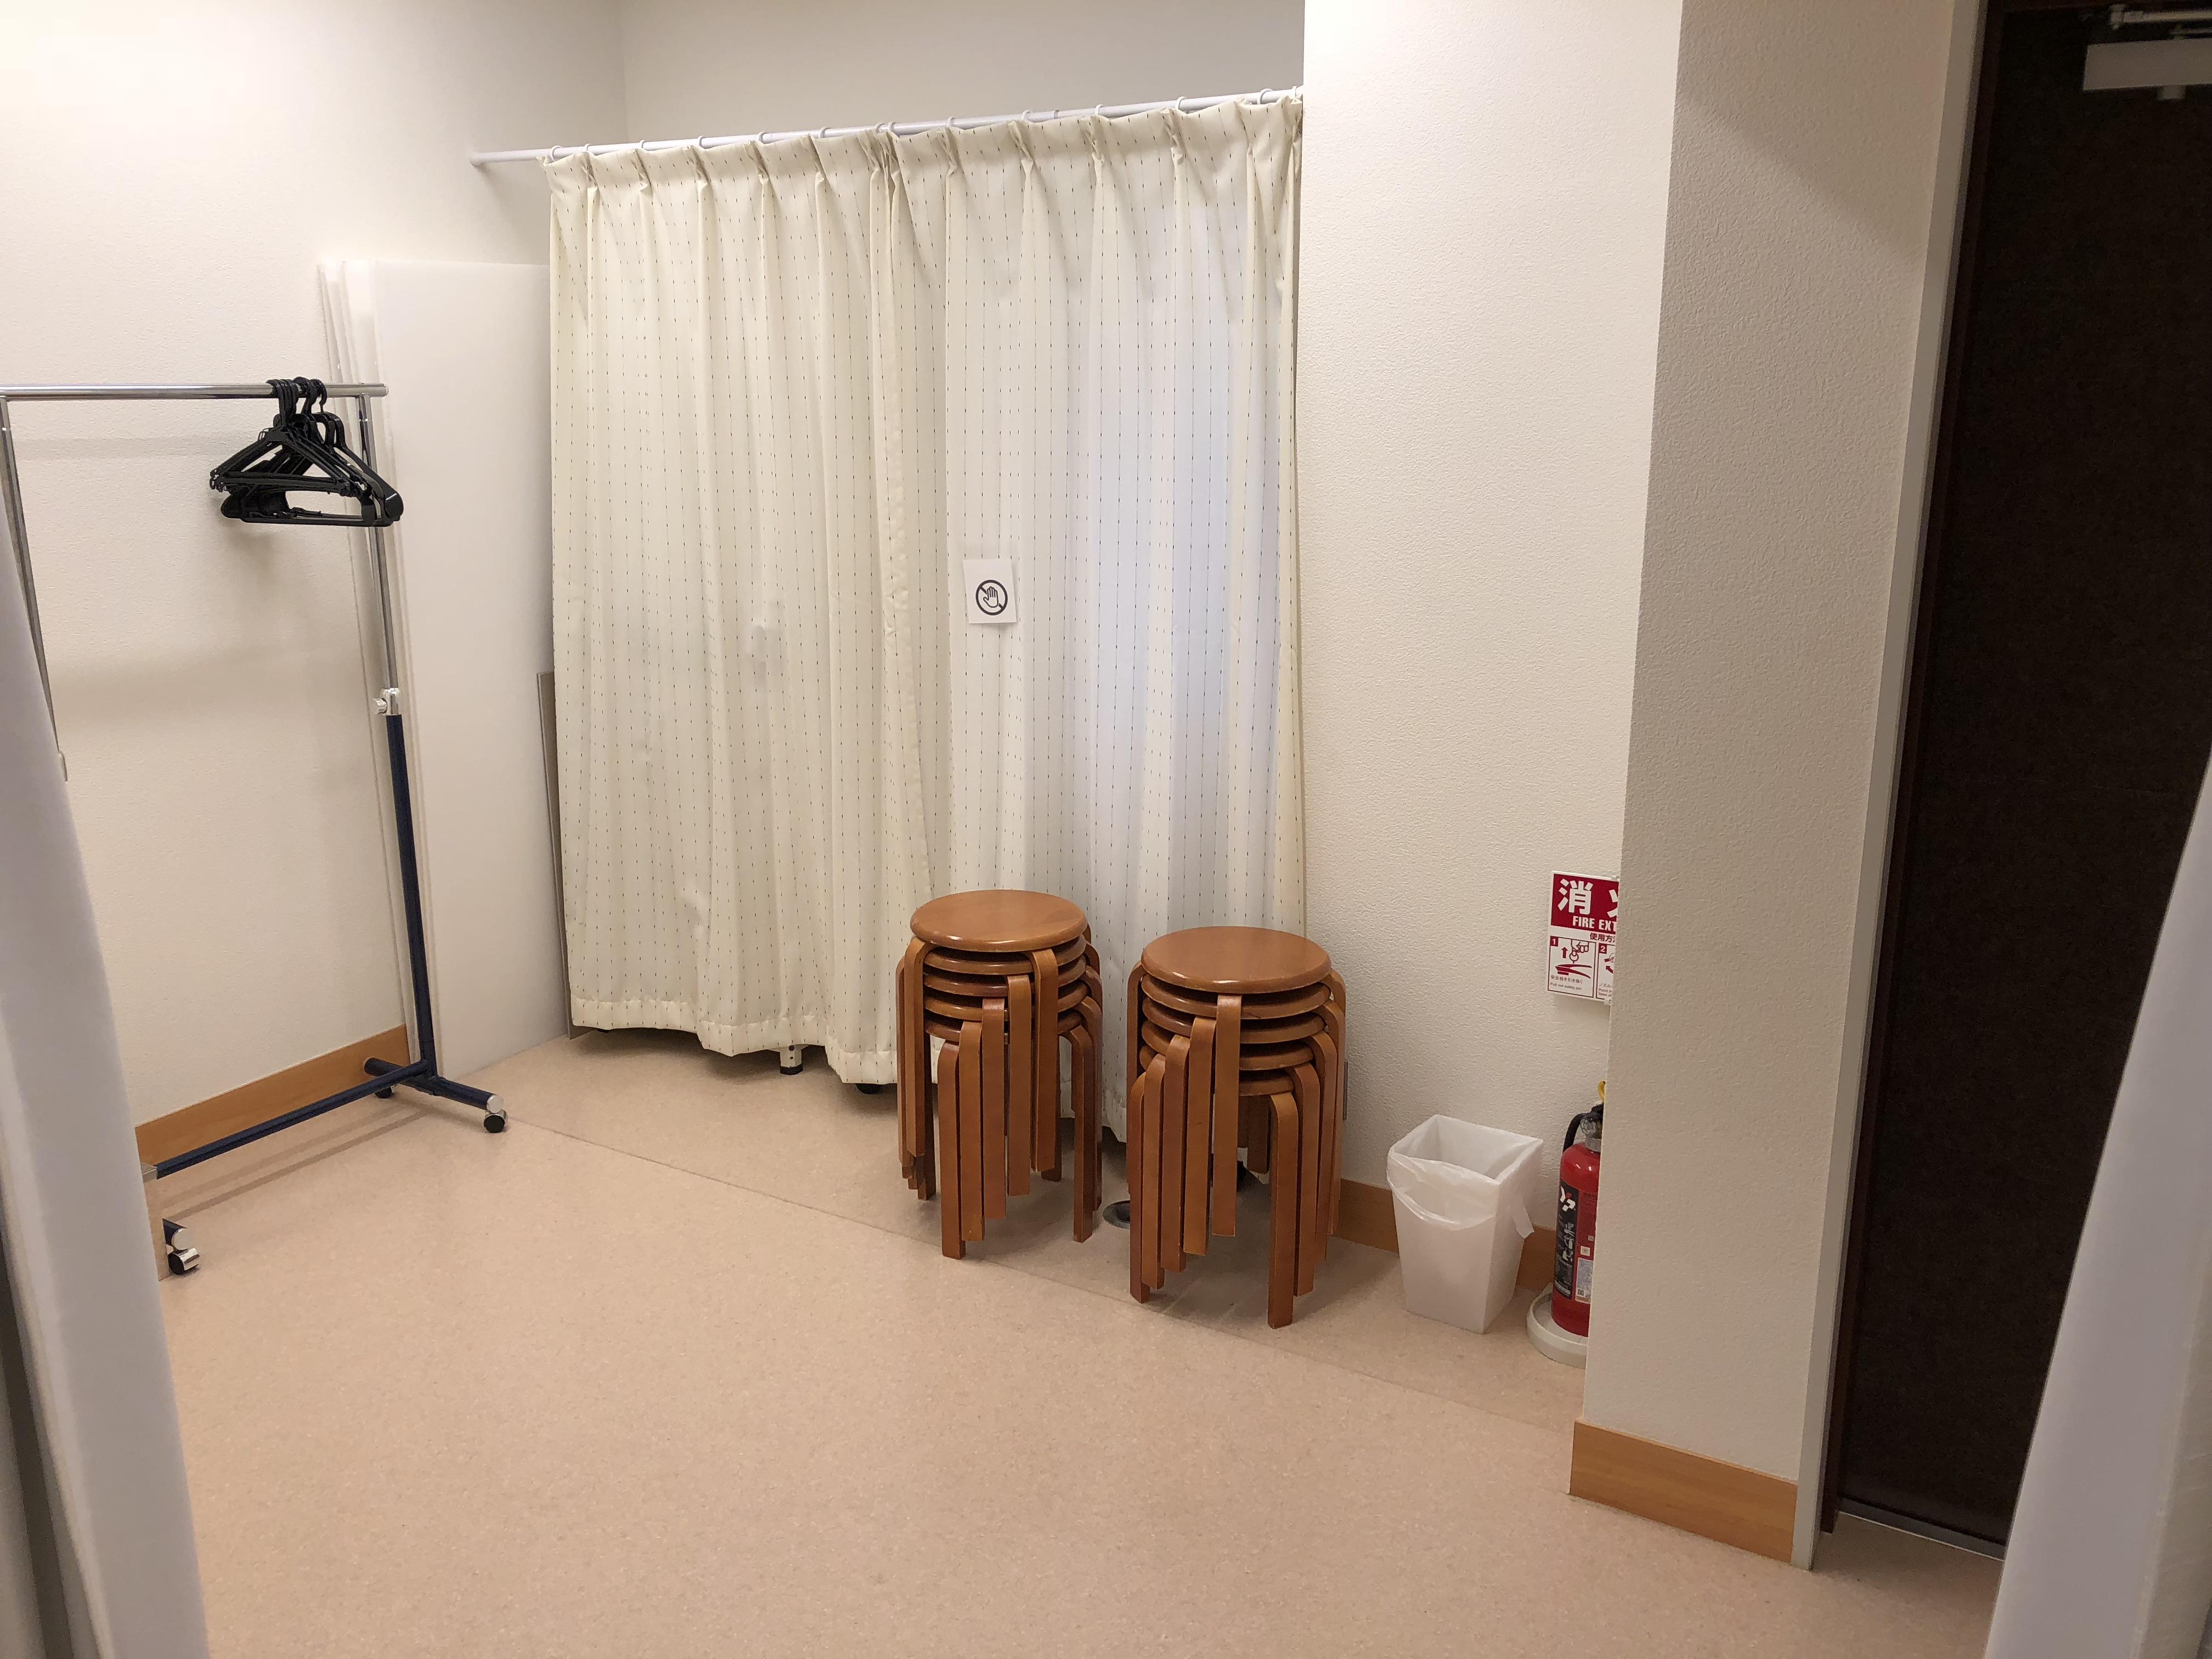 2m×3mの着替え、あるいは、荷物置き場のスペース